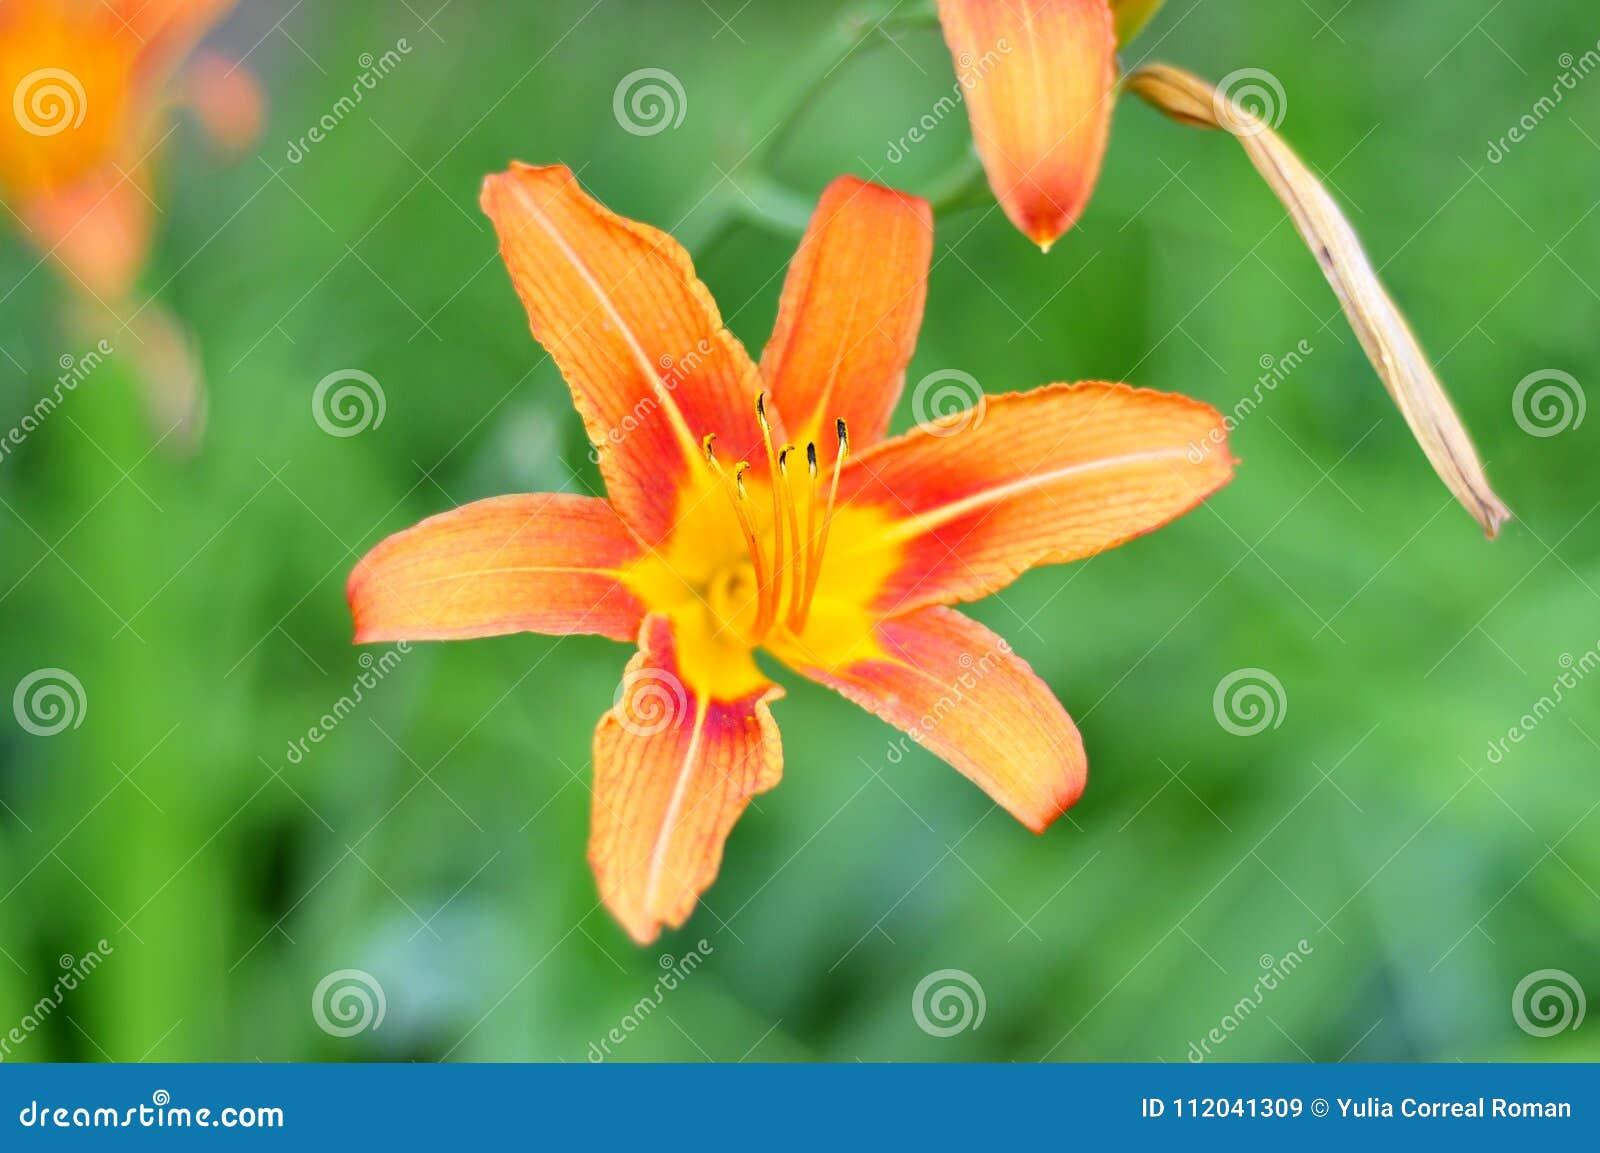 Flower Of Orange Royal Lily Stock Image Image Of Blue Artista